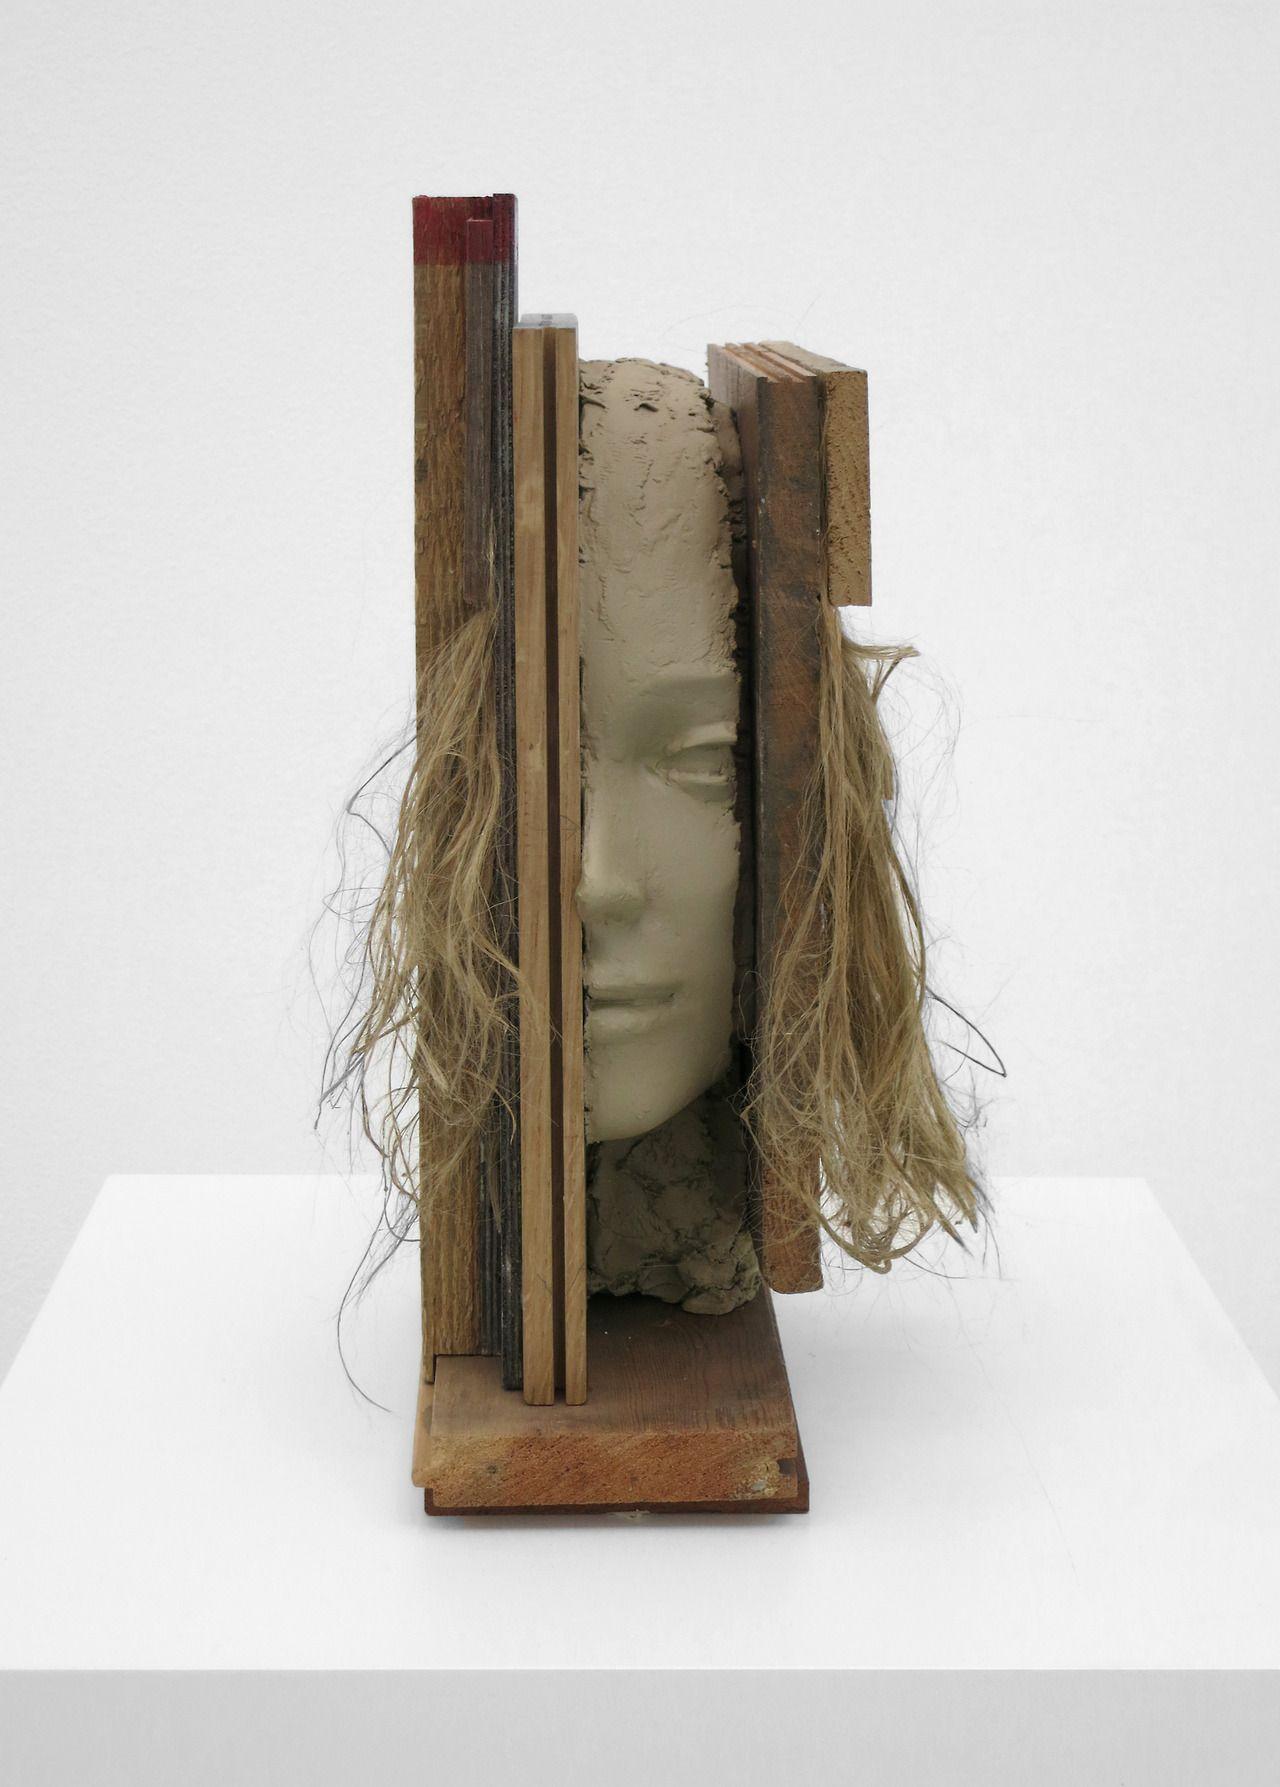 Mark Mandersat the 55th Venice Biennale Dutch Pavillion(2013)